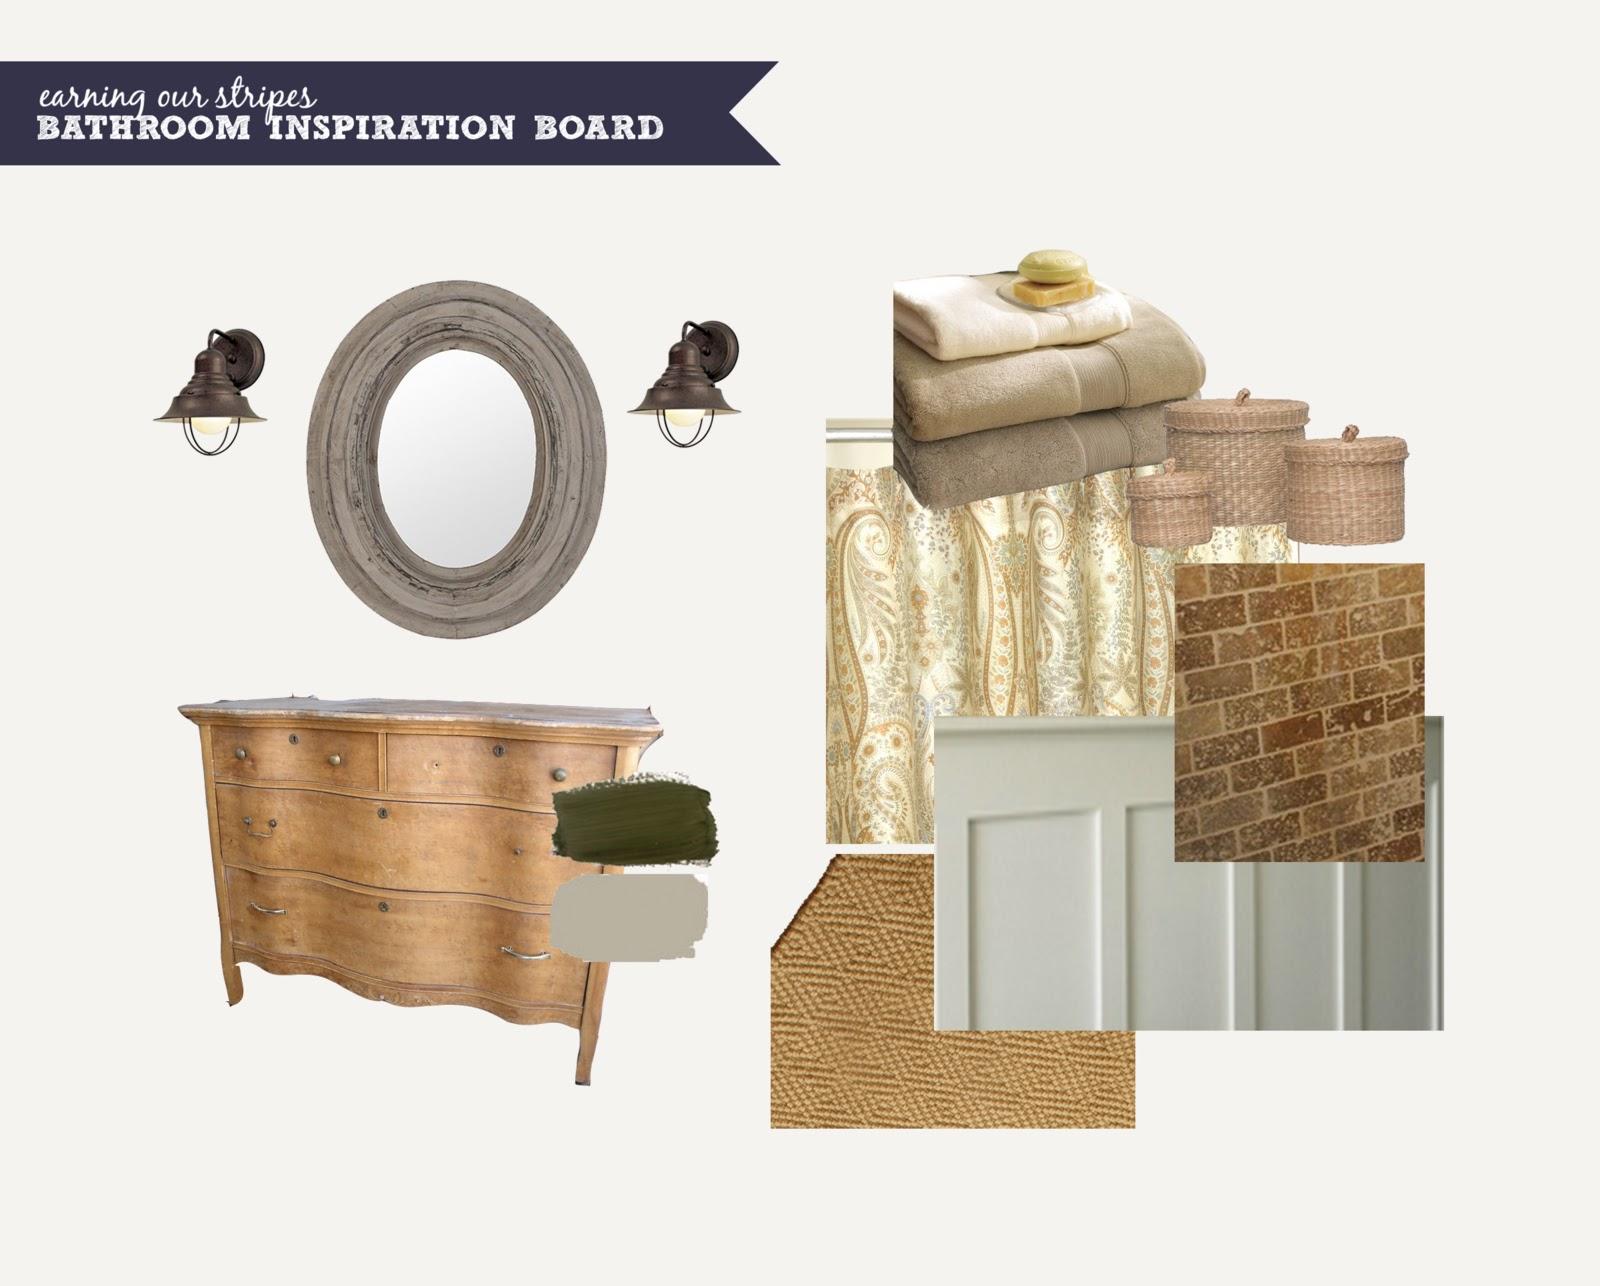 Earning our stripes bathroom renovation inspiration for Bathroom renovation inspiration